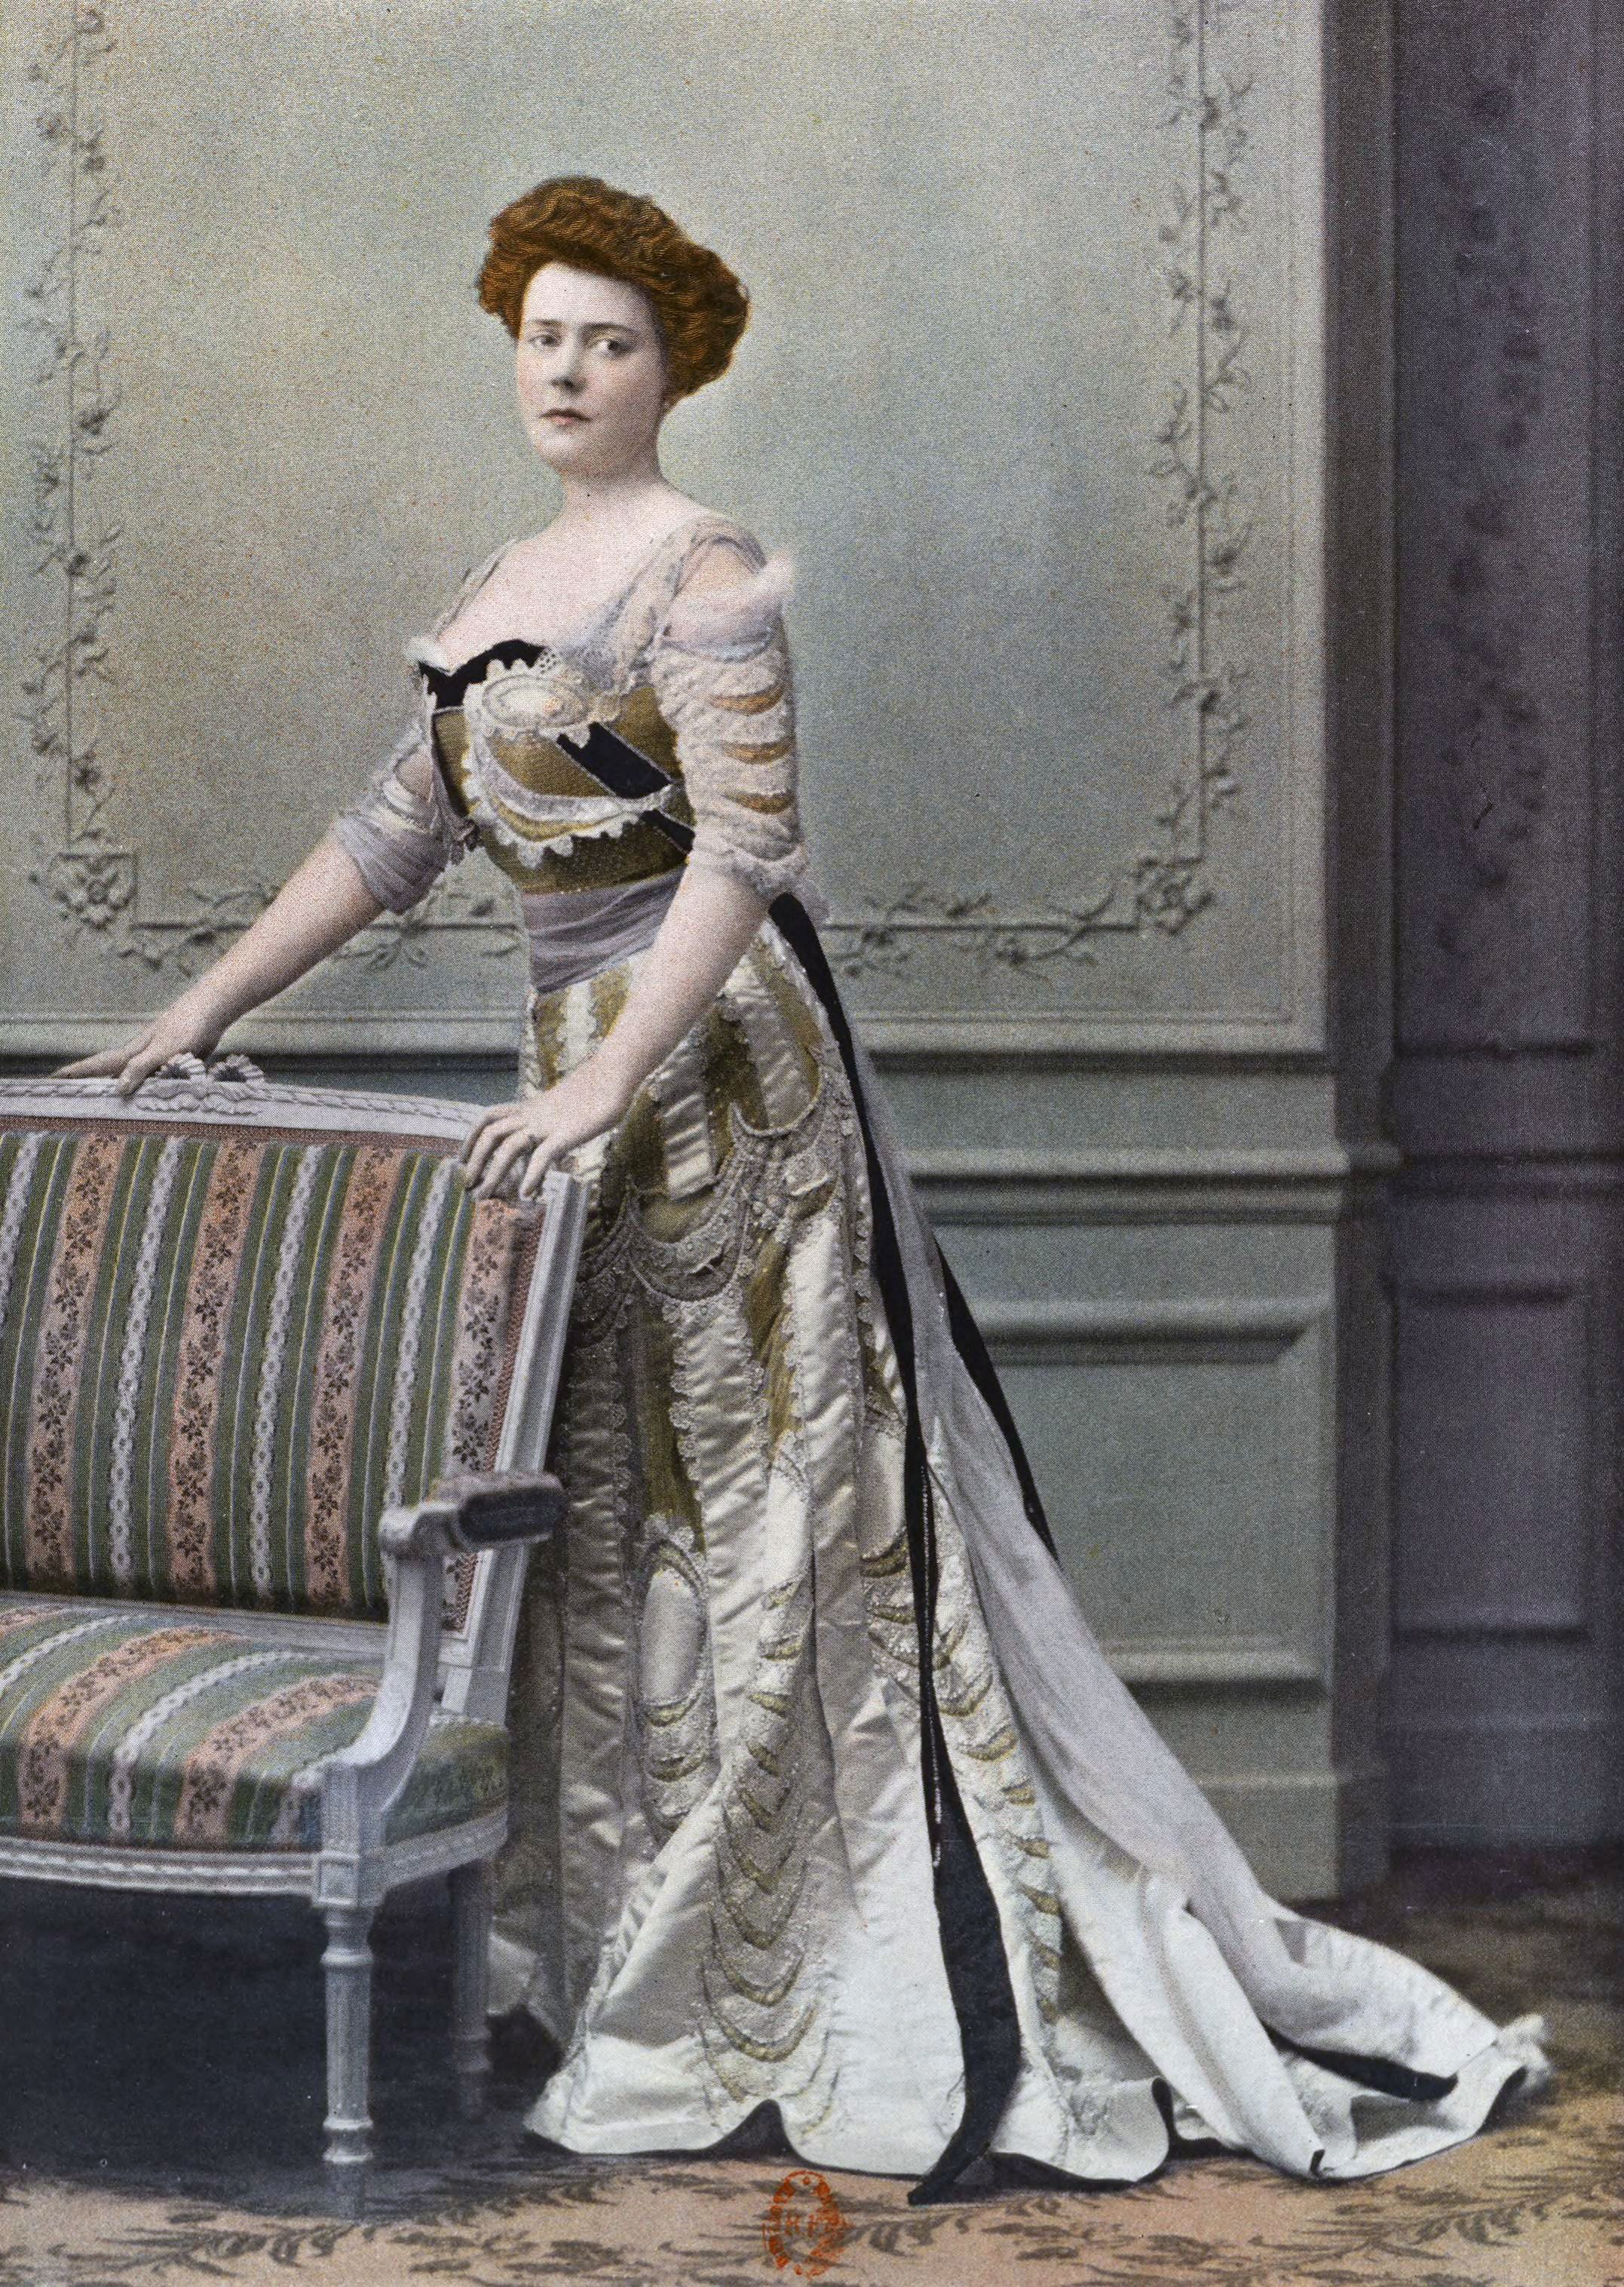 1901 February, Les Modes Paris - Ball gown \